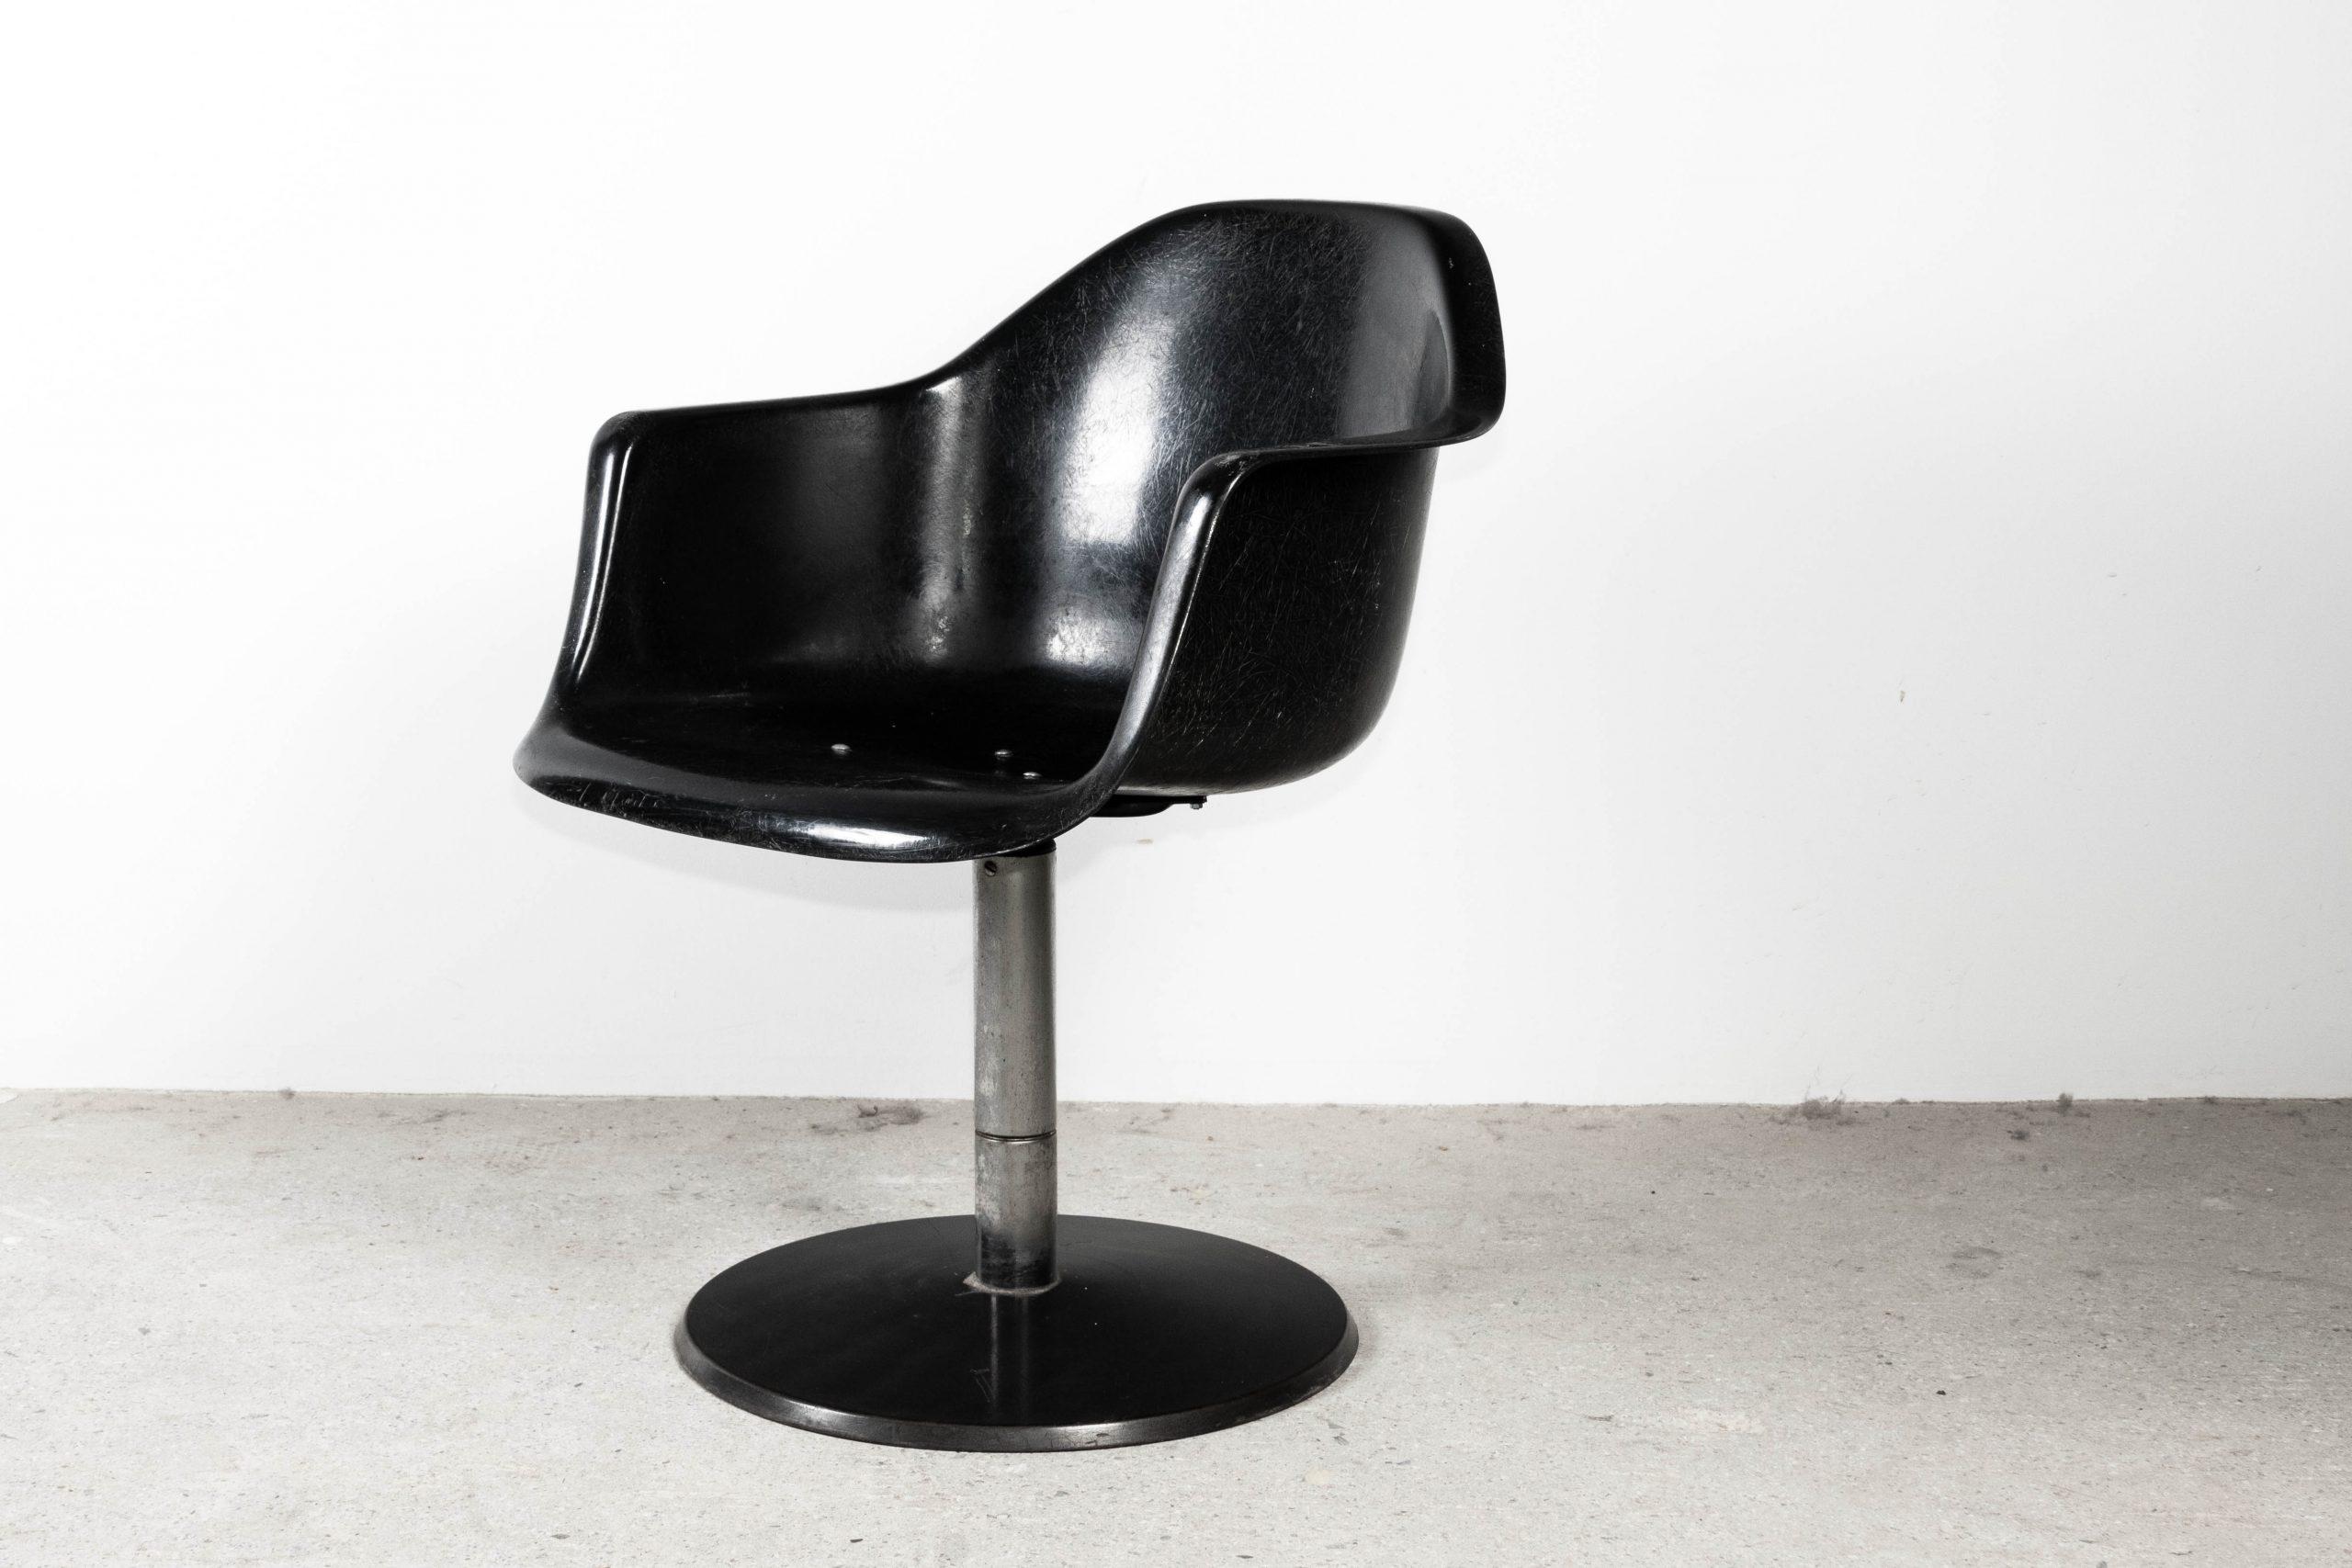 silla butaca eames negra fibra de vidrio diseño mid century giratoria reunion